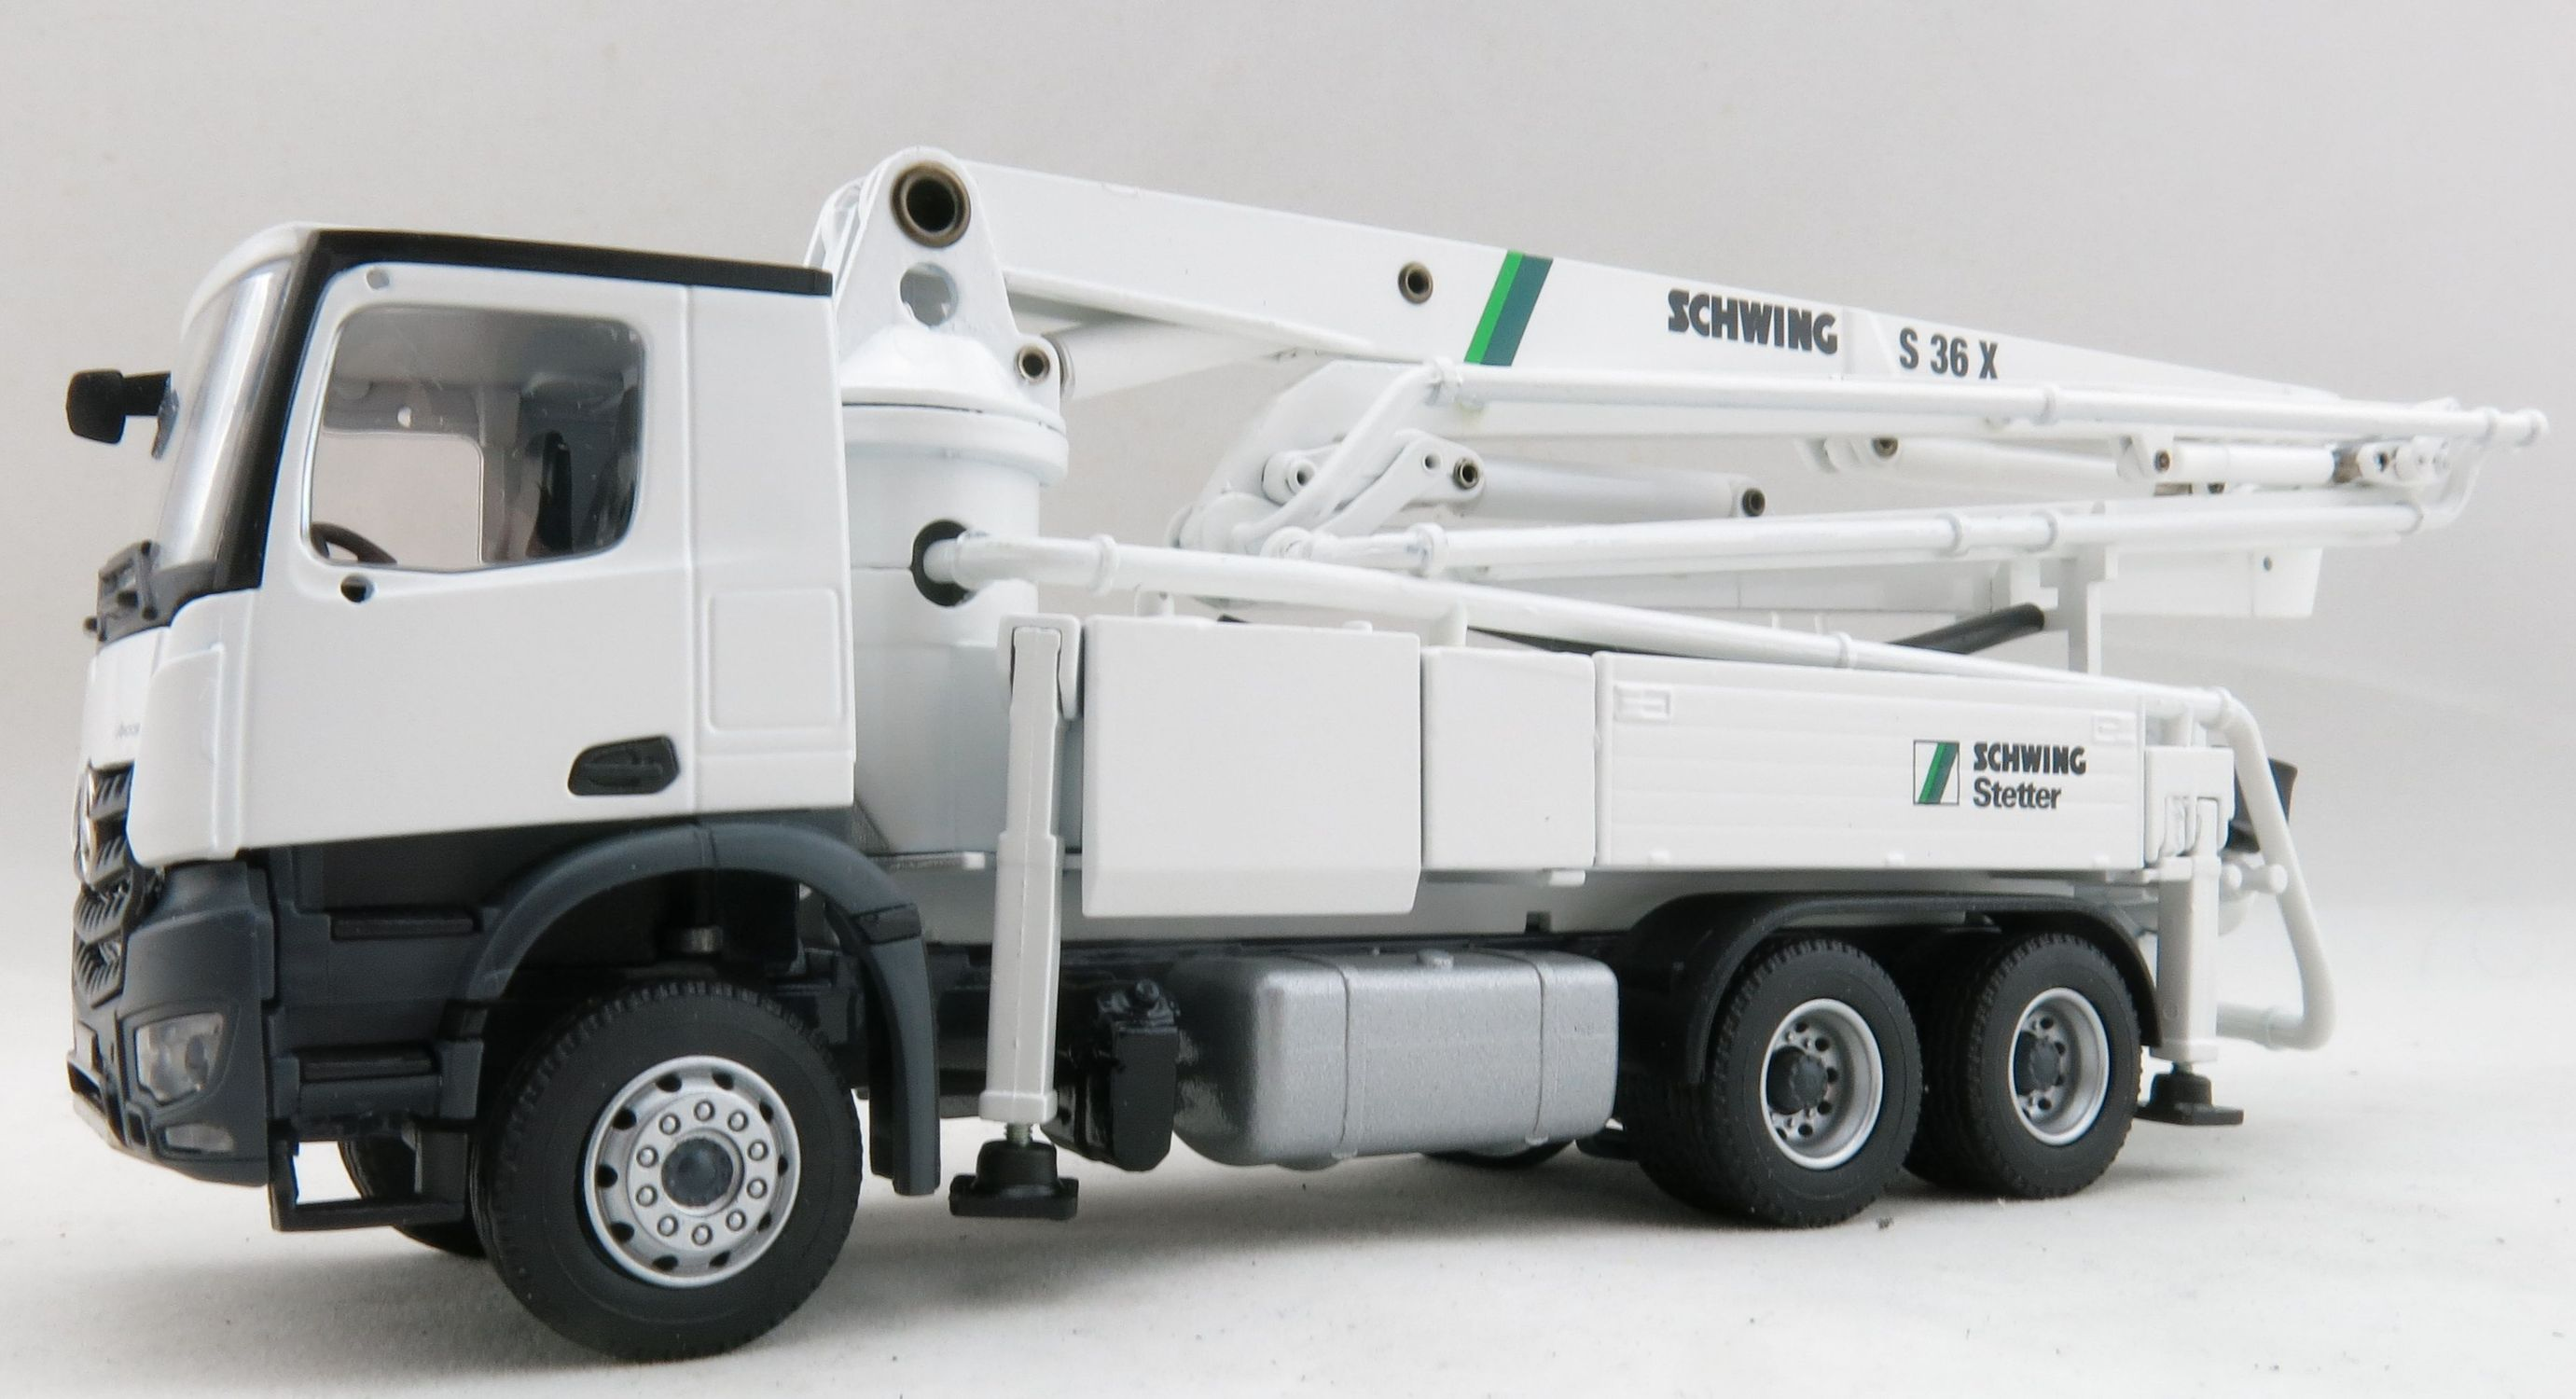 Details about Conrad 78225-0 Mercedes Benz Arocs Truck with Schwing S36X  Concrete Pump 1:50